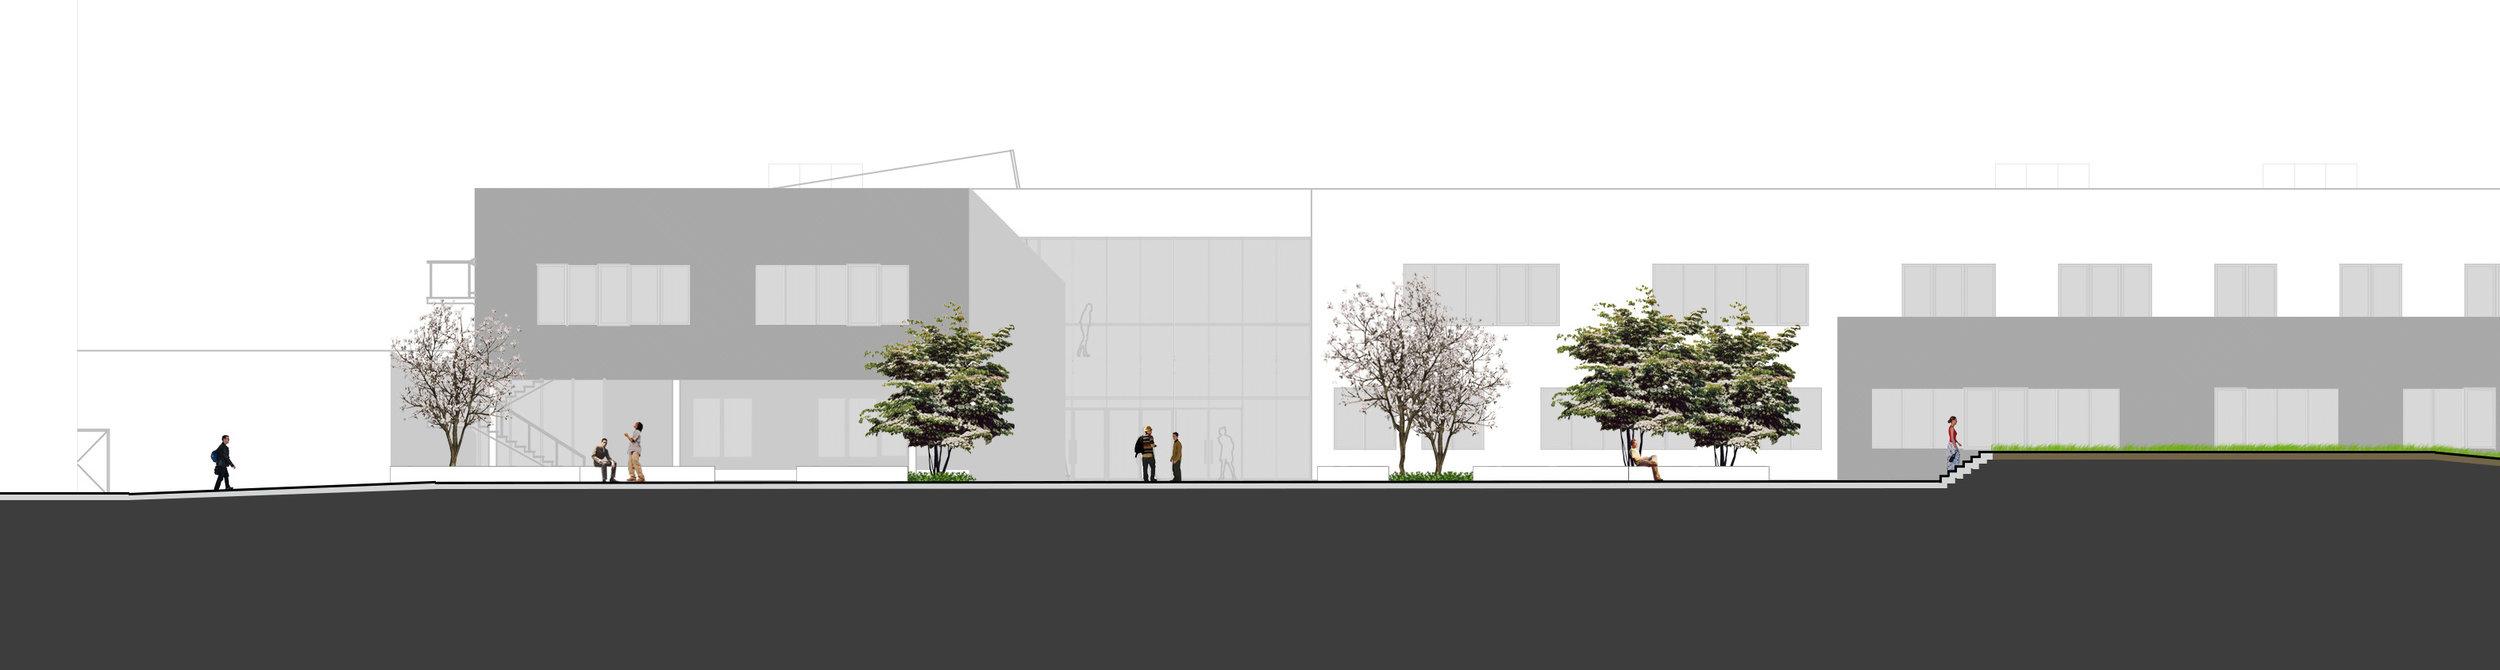 lycée_gabriel_péri_champigny_sur_marne_public_outdoor_design_christophe_gautrand_paysagiste_7.jpg